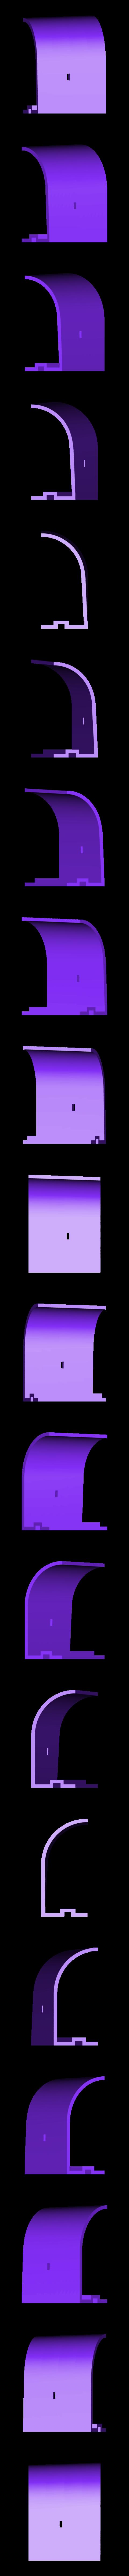 Boiler_Section_4-_SCALED-1.STL Download free STL file 4-8-8-4 Big Boy Locomotive • 3D printer object, RaymondDeLuca